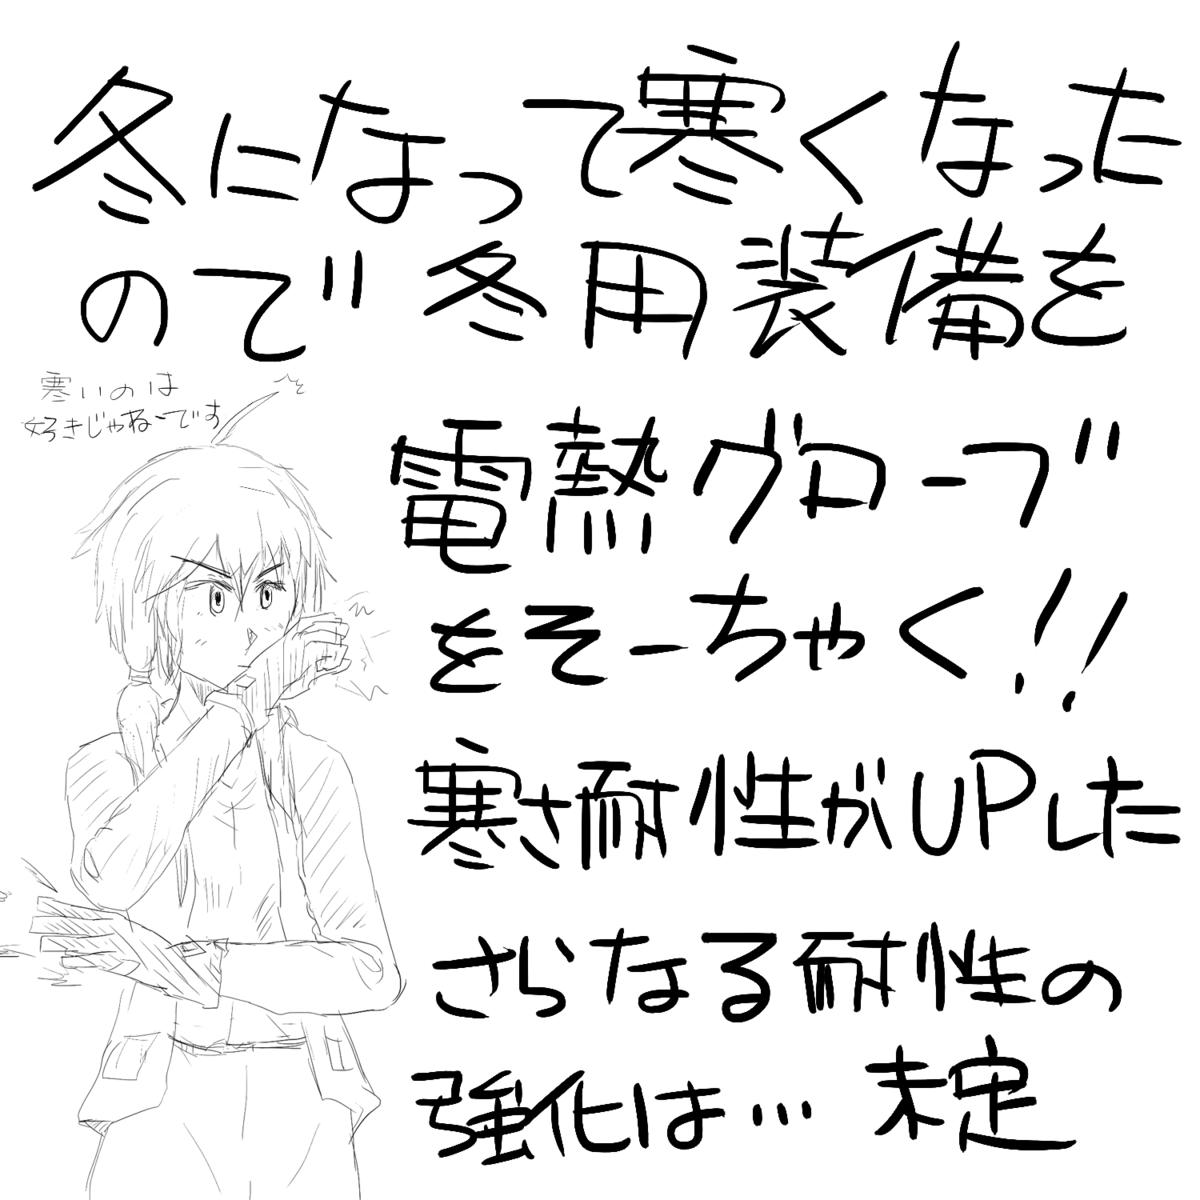 f:id:zomuzomu:20201113120821p:plain